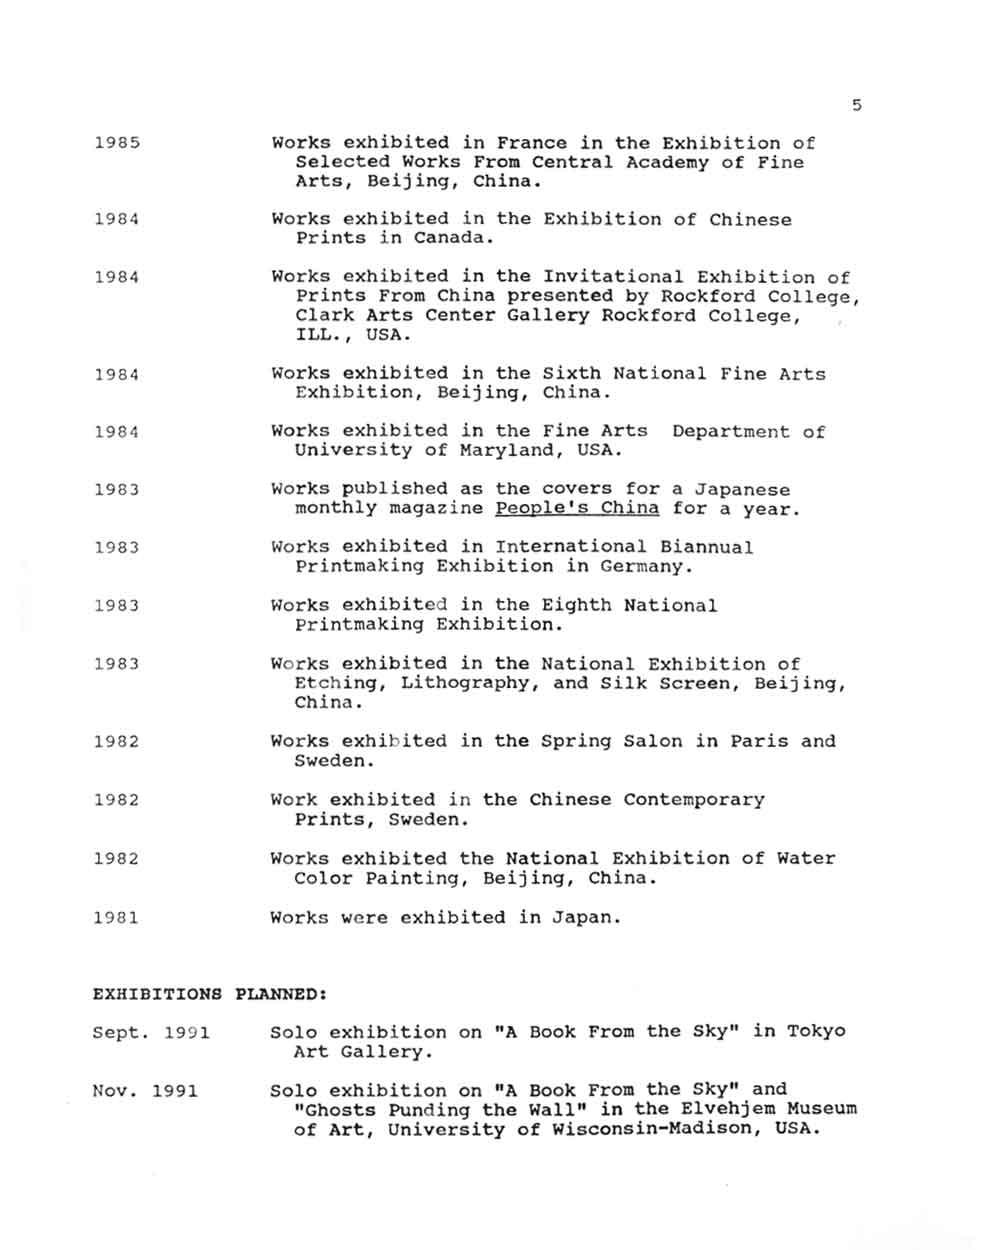 Bing Xu's Resume, pg 5